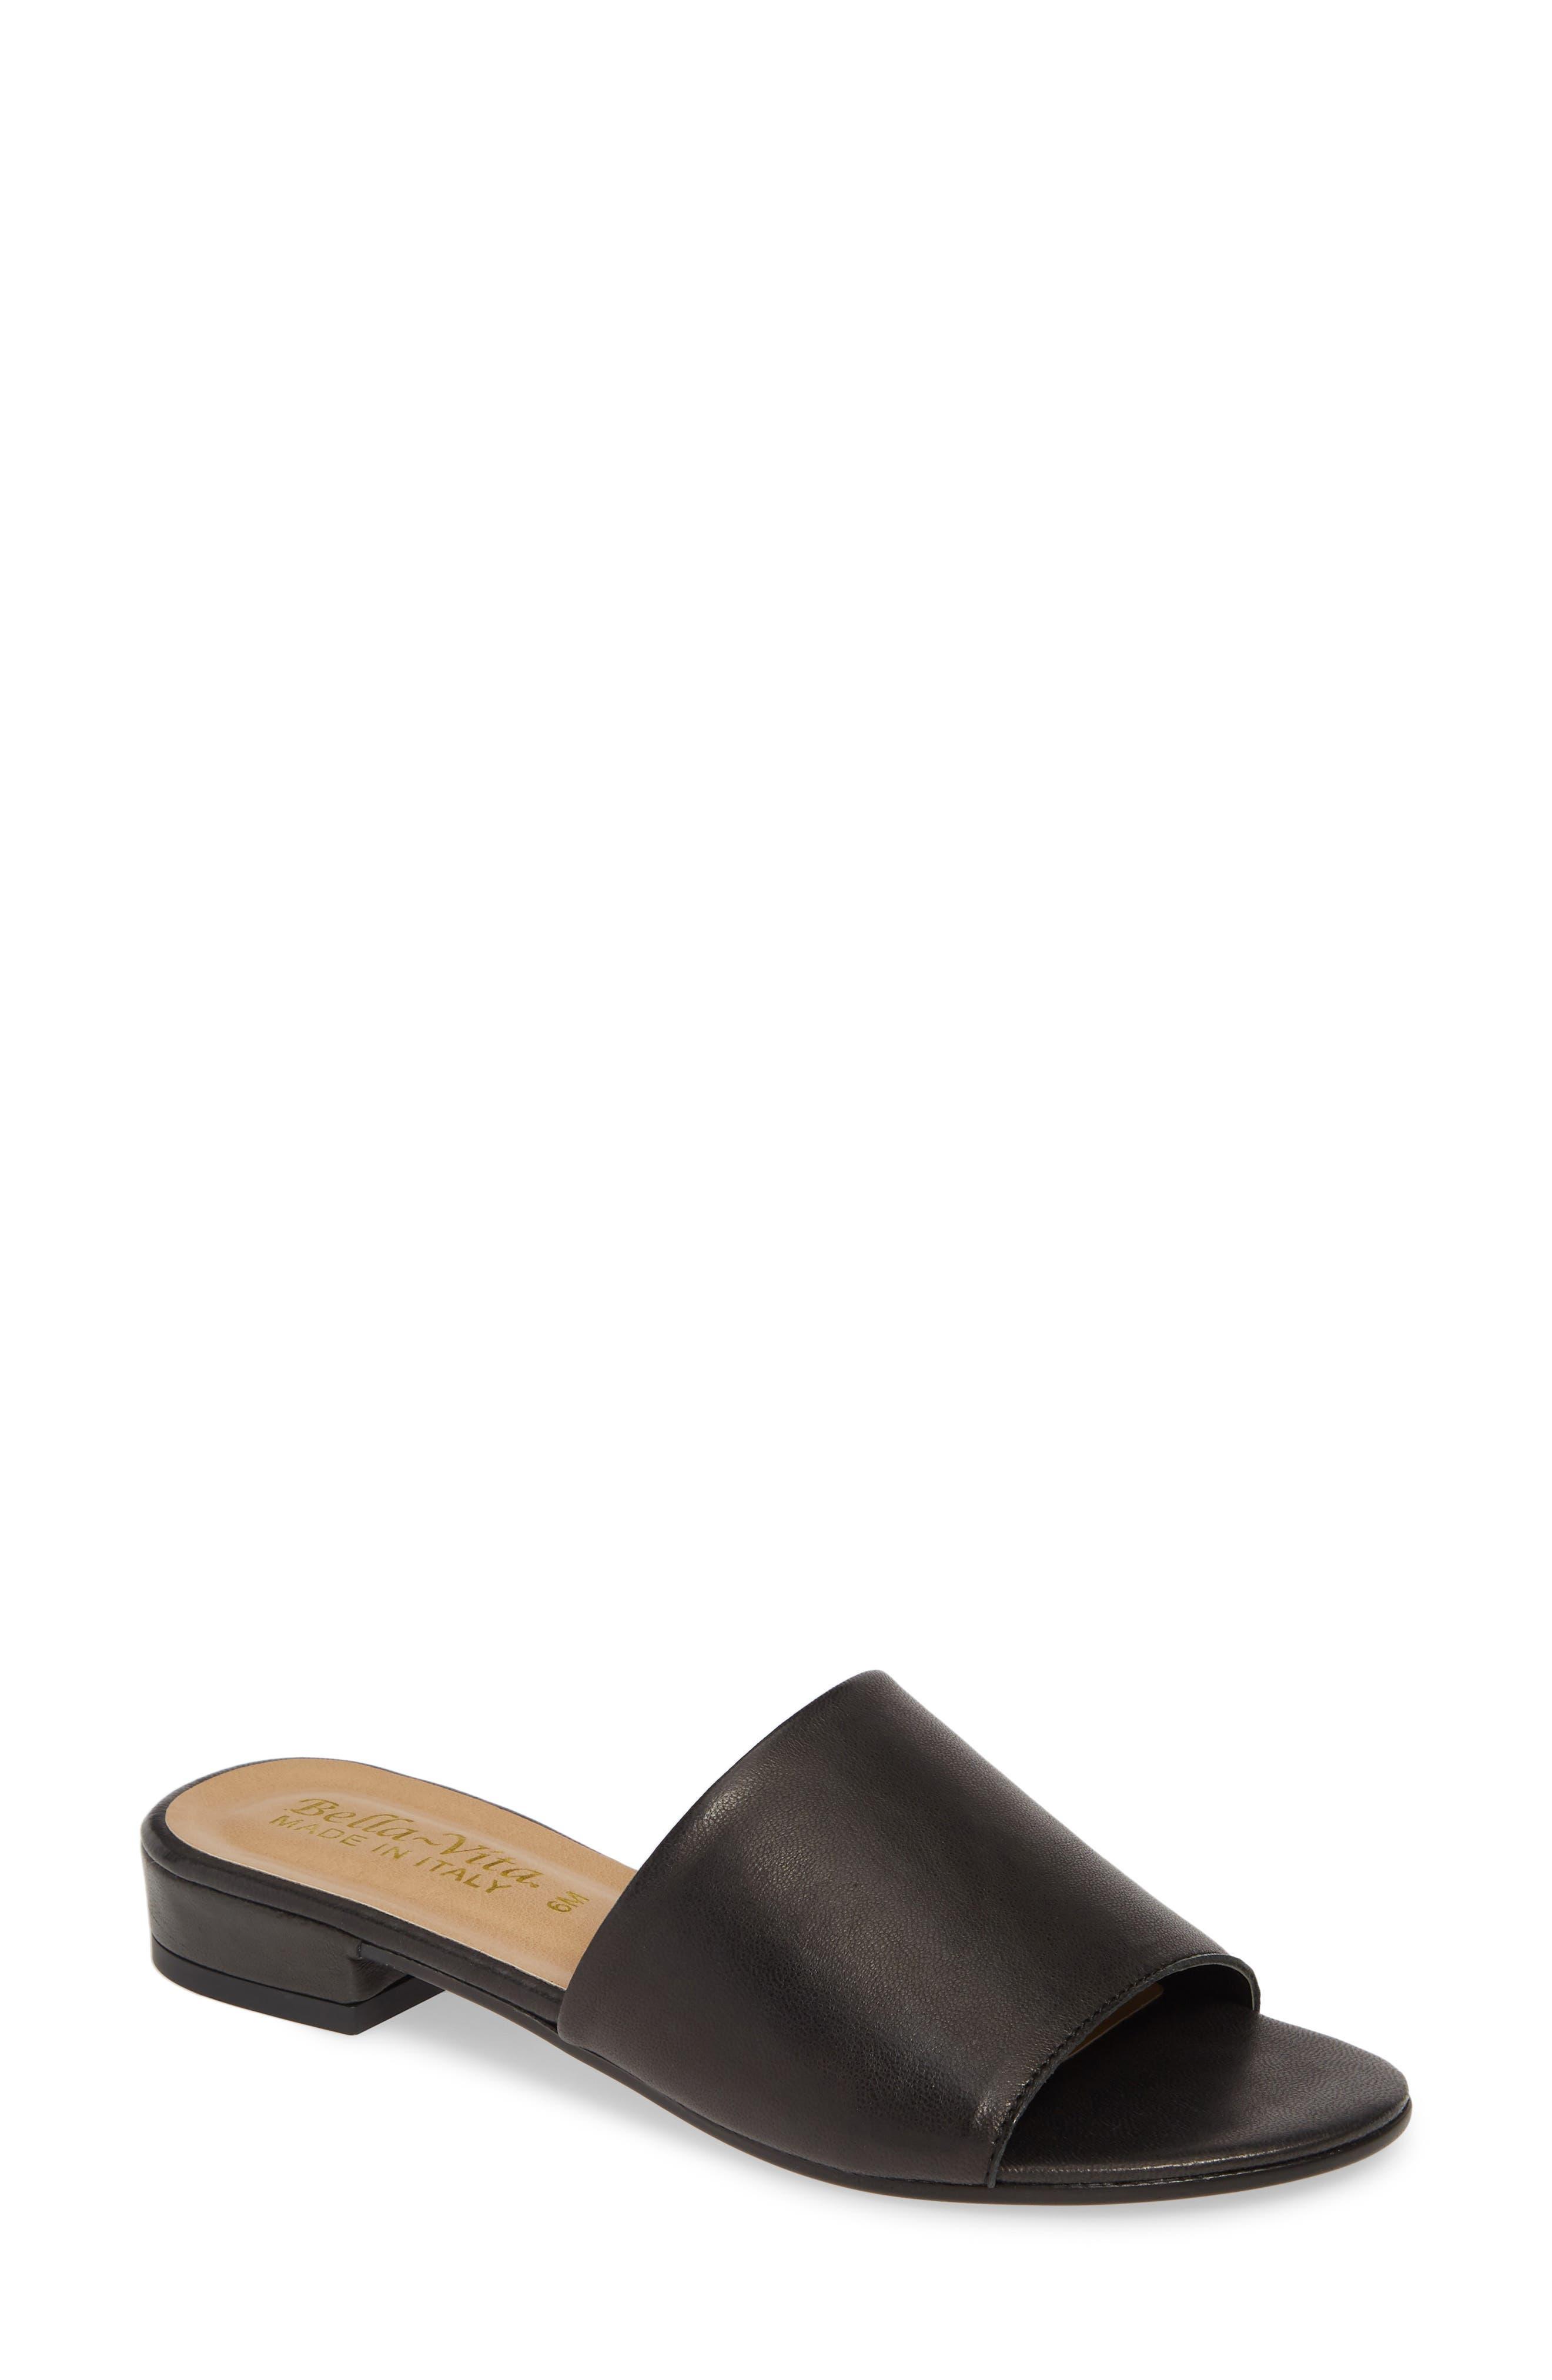 Slide Sandal, Main, color, BLACK ITALIAN LEATHER